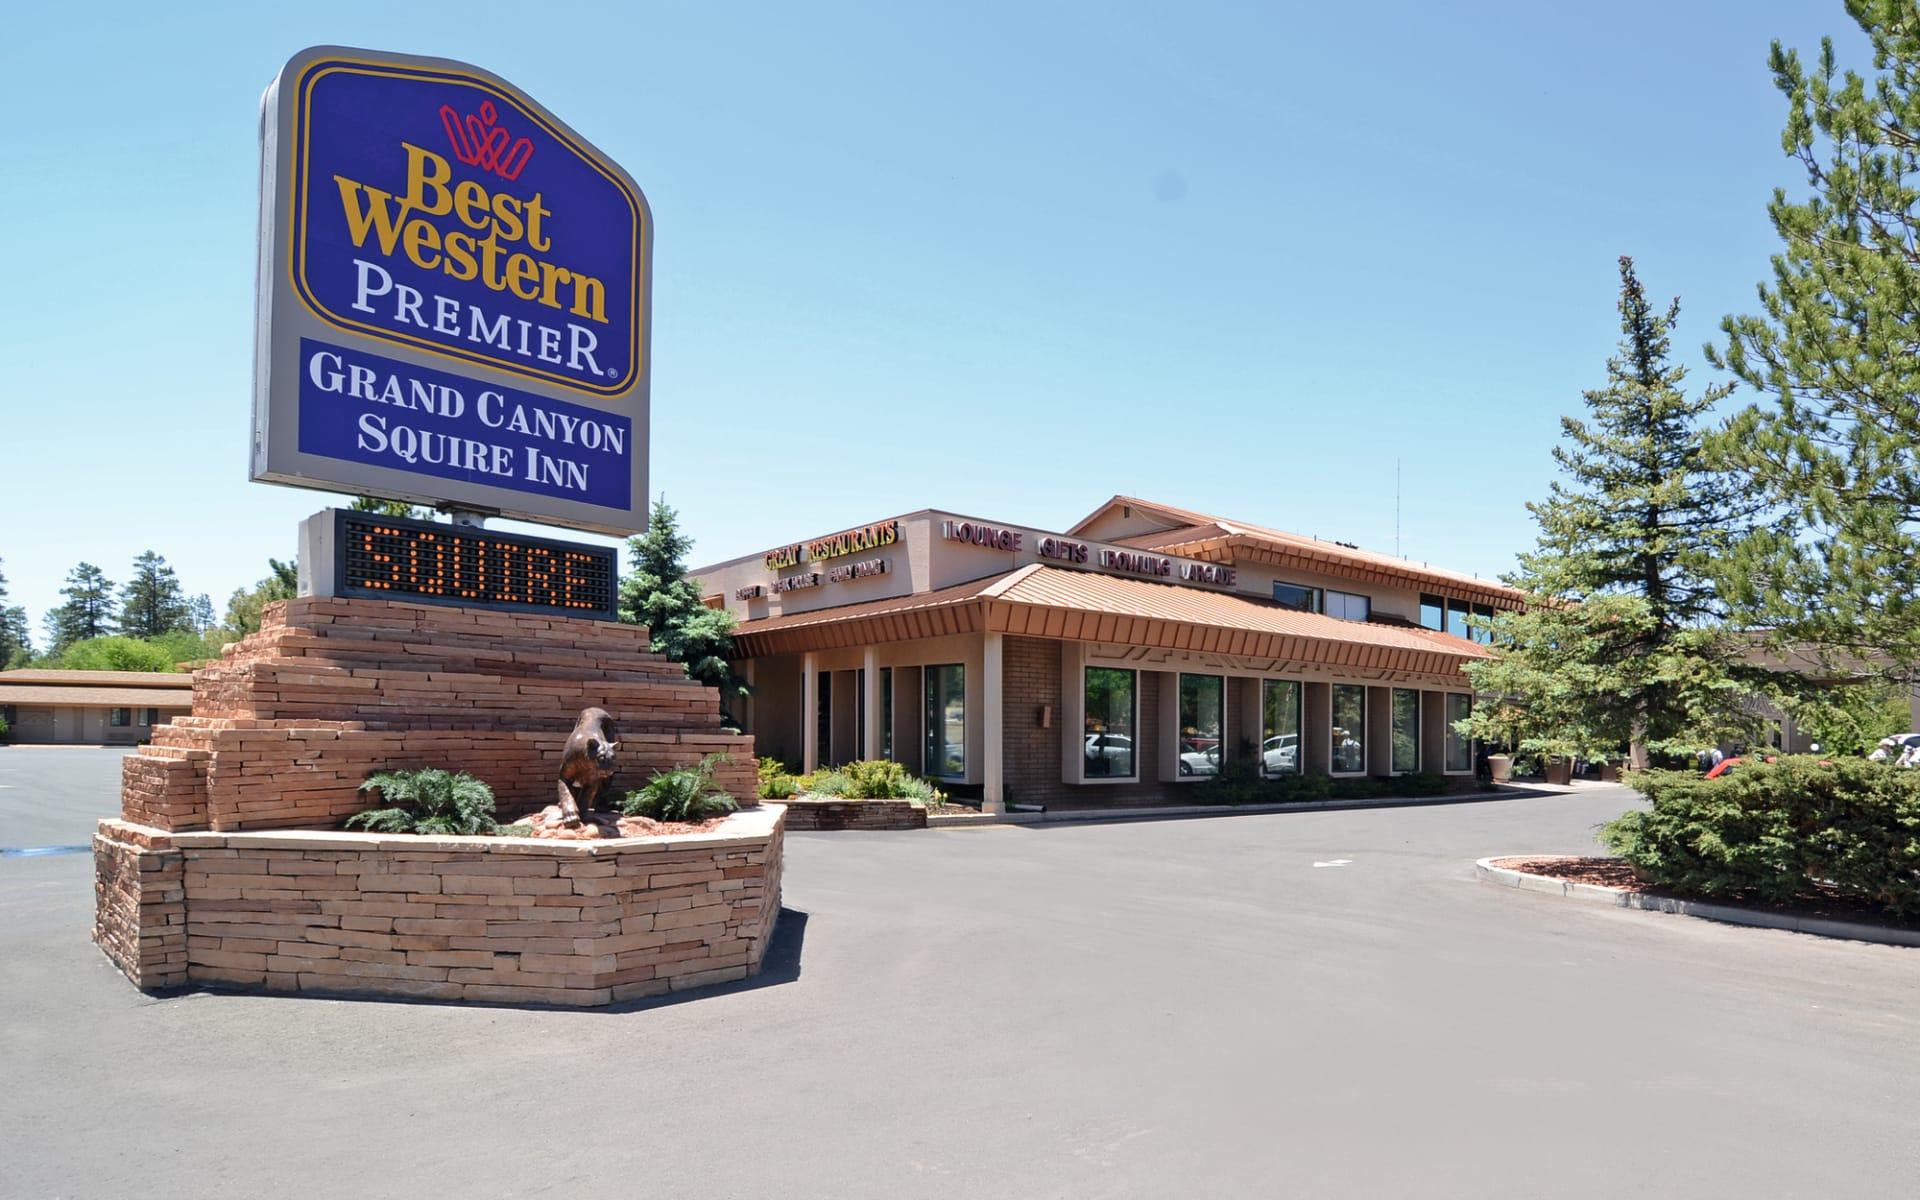 Best Western Premier Grand Canyon Squire Inn in Grand Canyon Nationalpark: Best Western Premier Grand Canyon Squire Inn - Hotel Aussenansicht